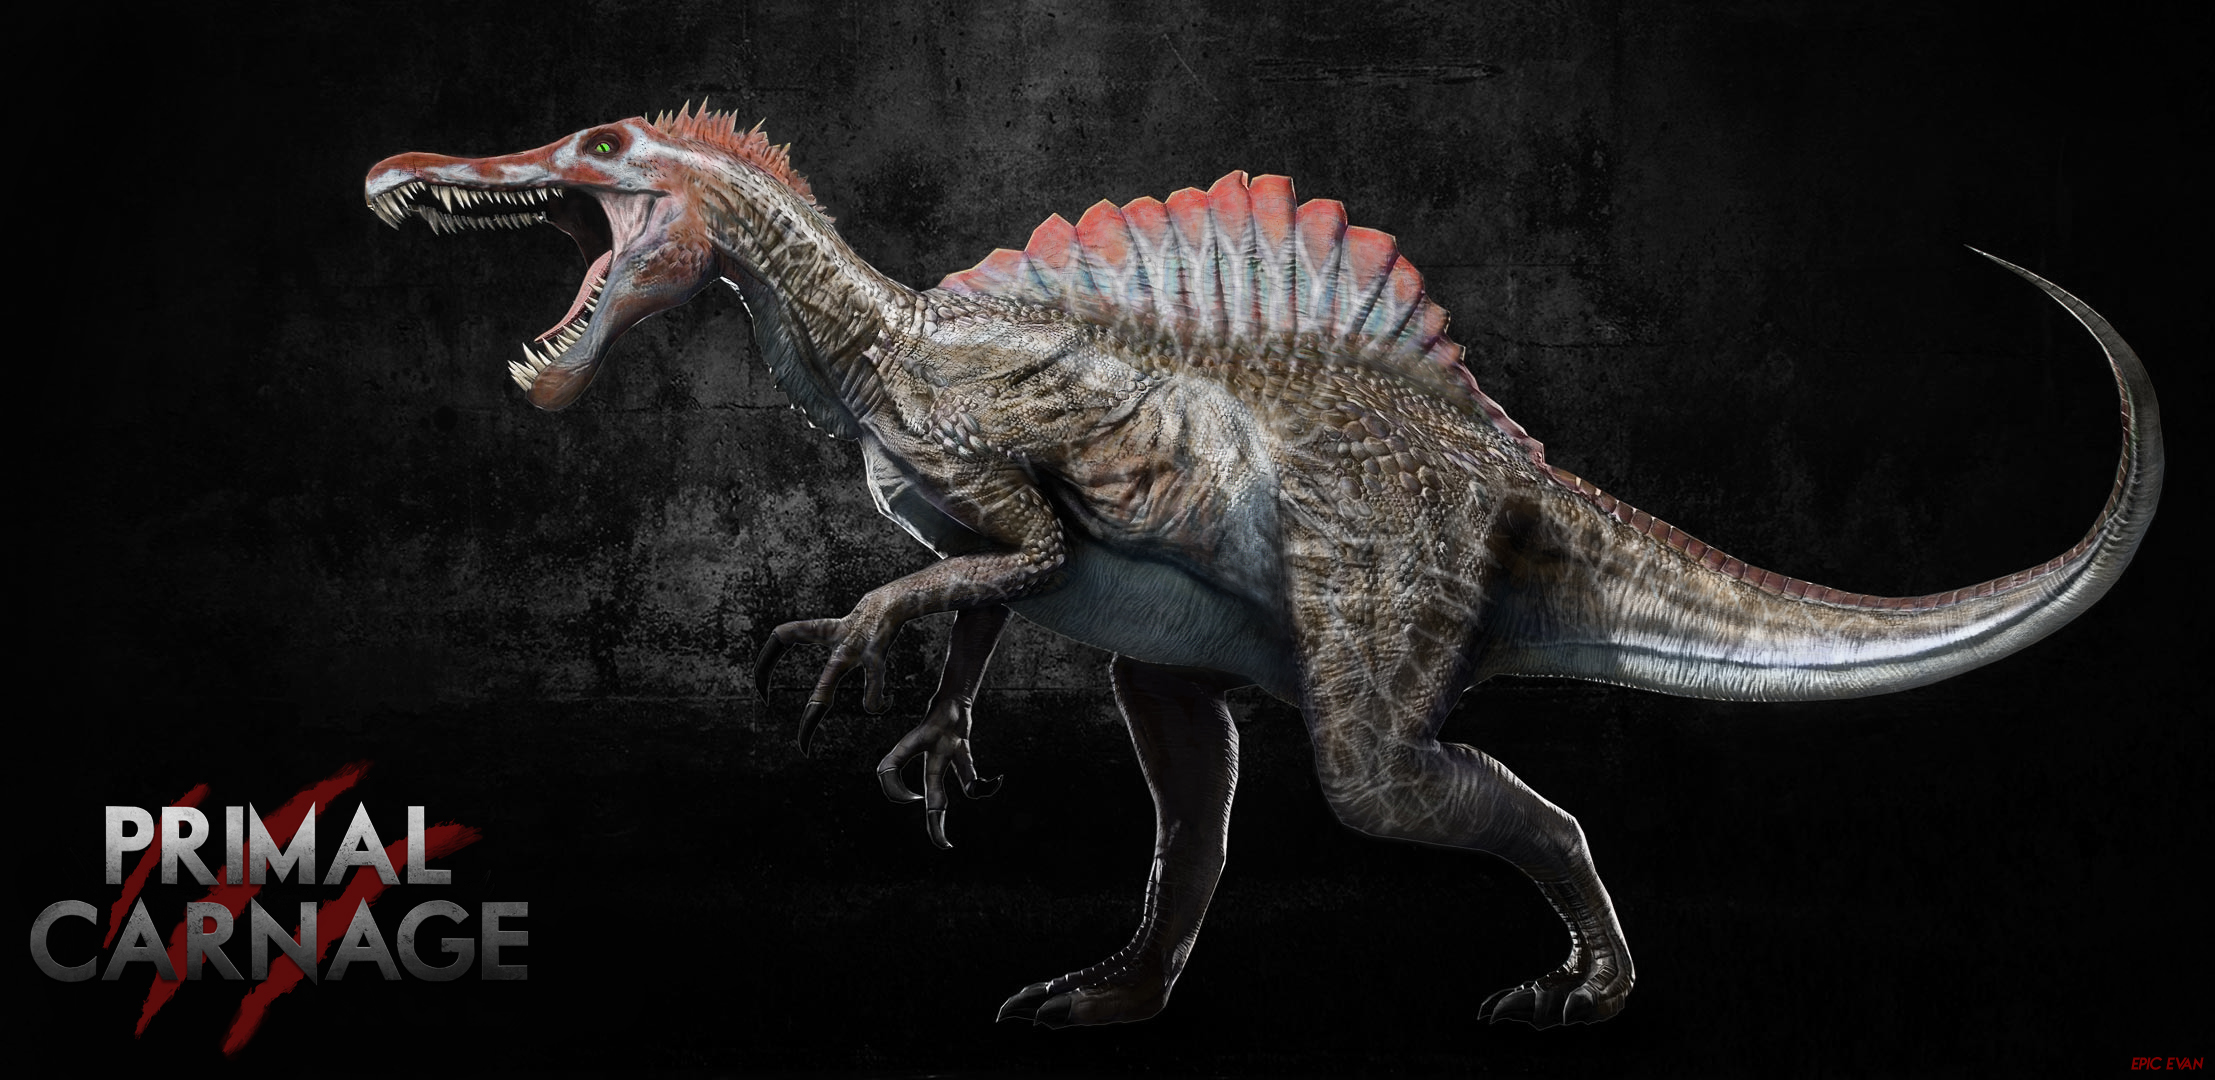 Primal Carnage reskin JPIII Spinosaurus by Gandalf the Ghey on 2215x1080